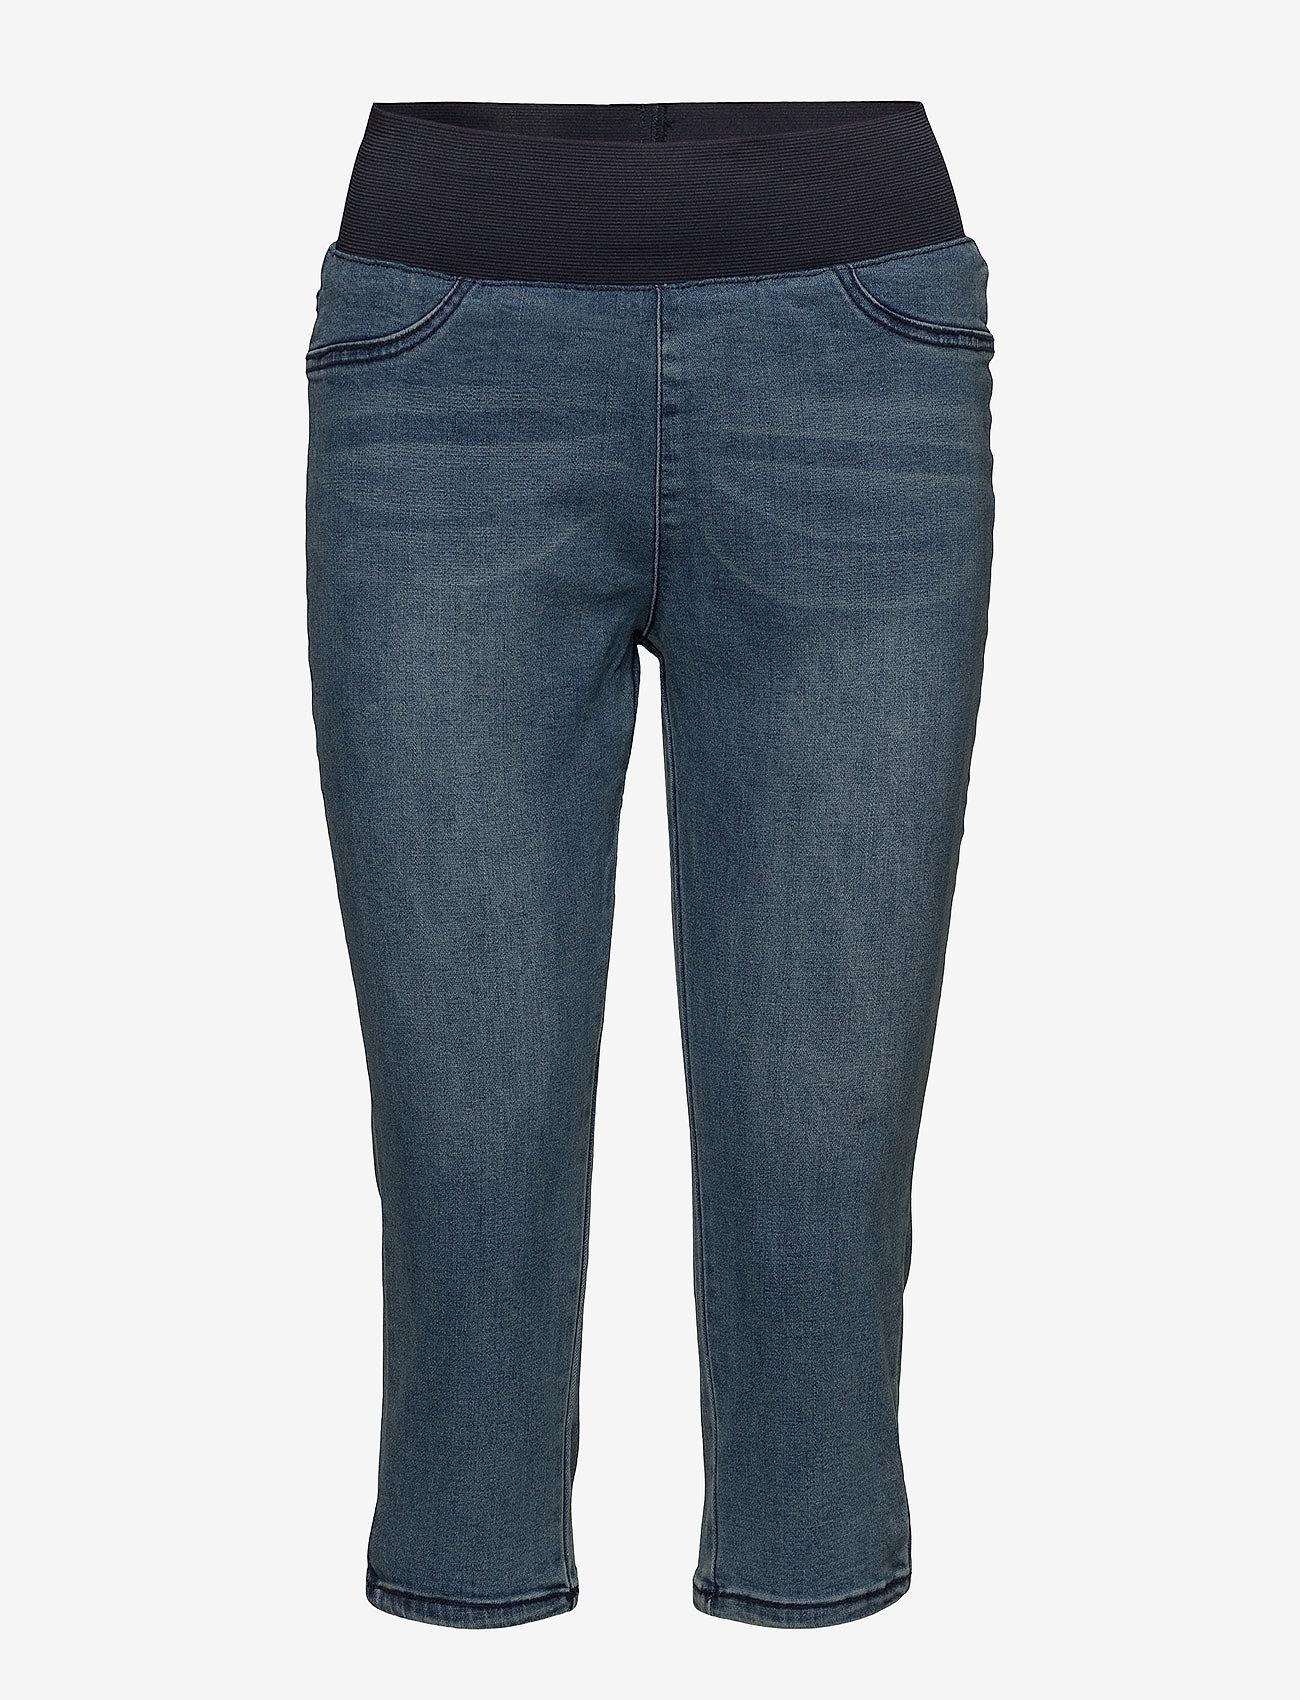 FREE/QUENT - SHANTAL-CA-DENIM - pantalons capri - medium blue denim - 0